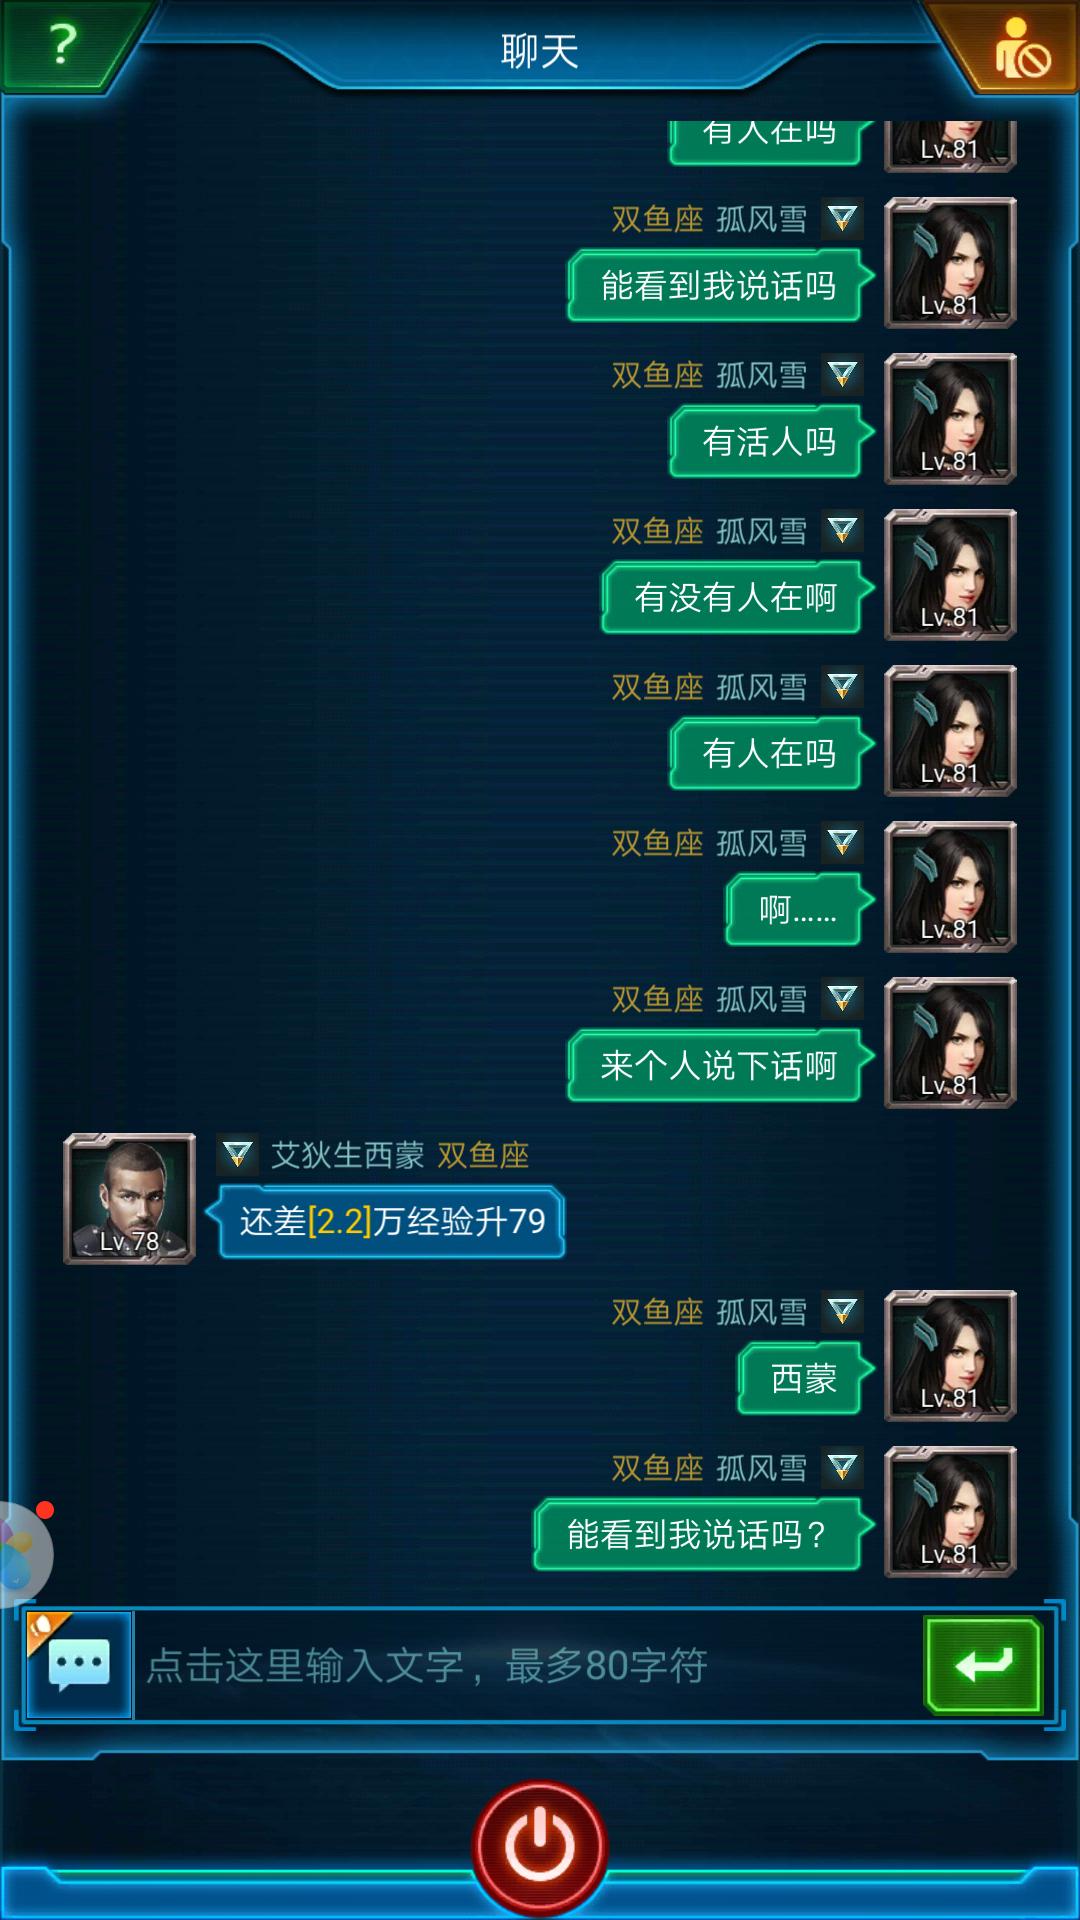 Screenshot_20180726-143513.png